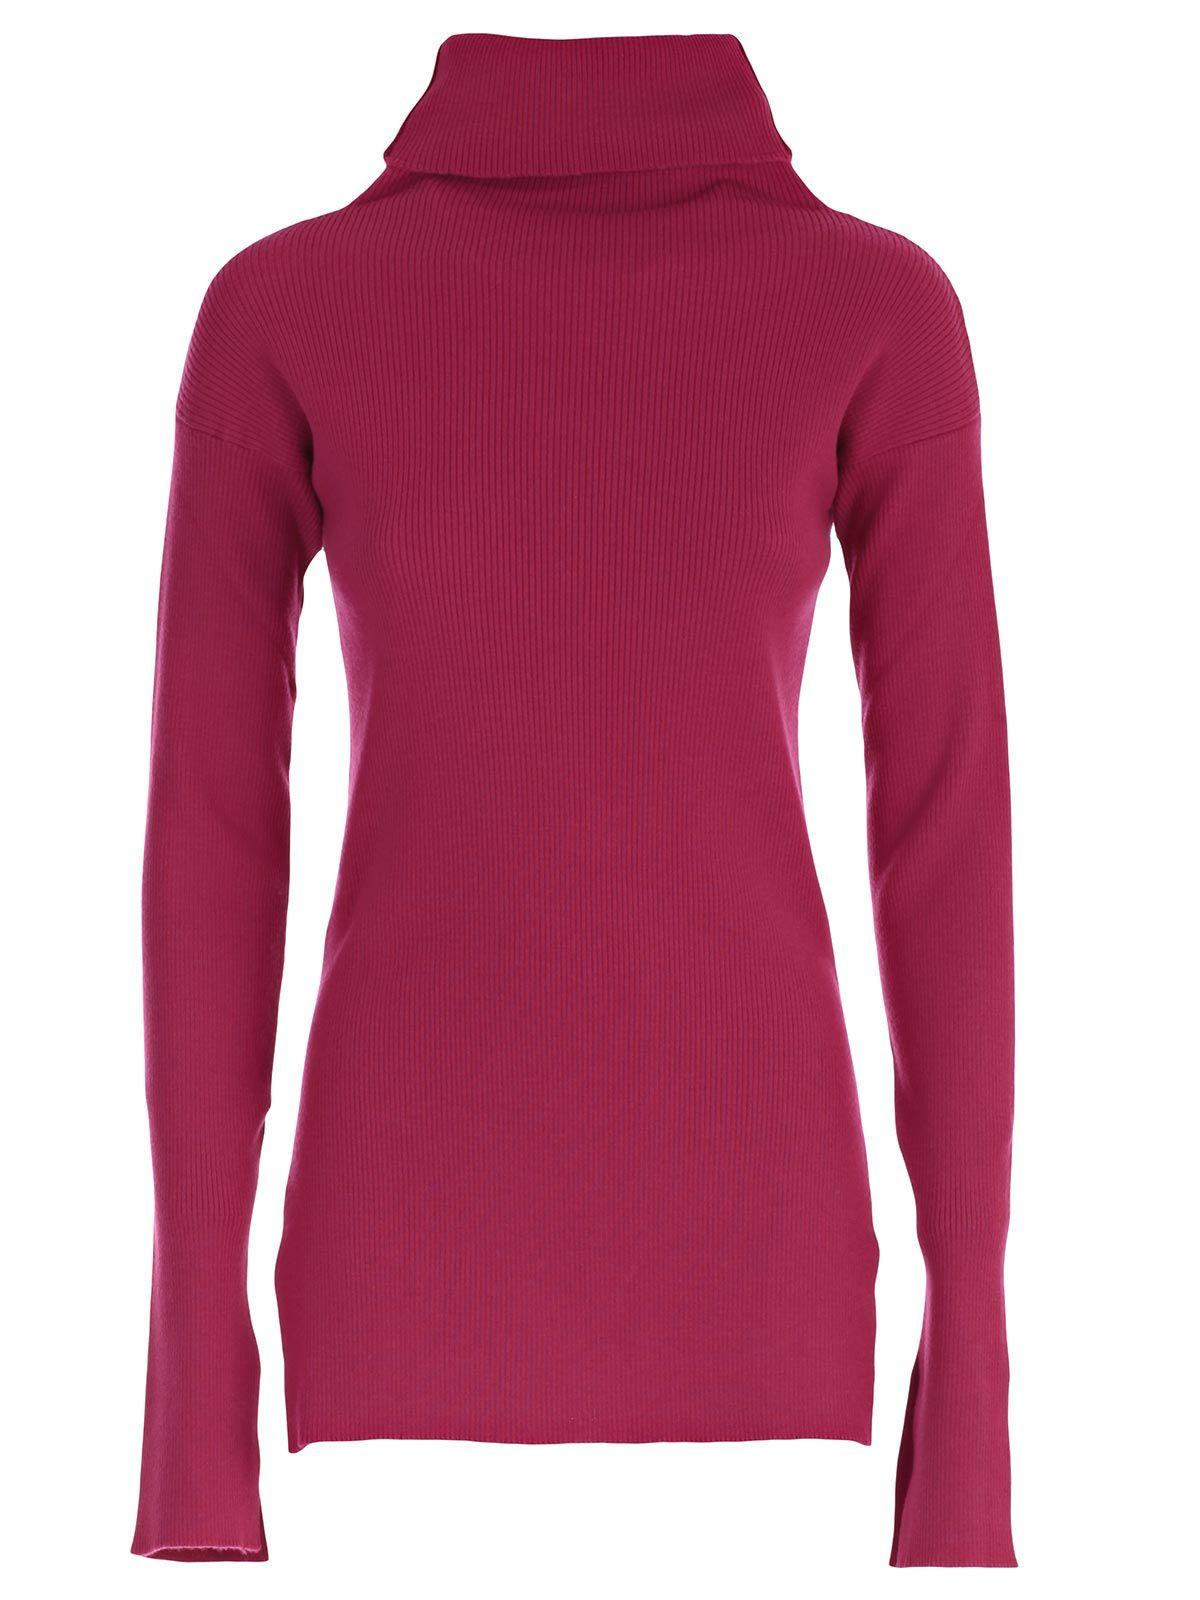 Erika Cavallini - Erika Cavallini Sweater - Pink & Purple, Women's ...